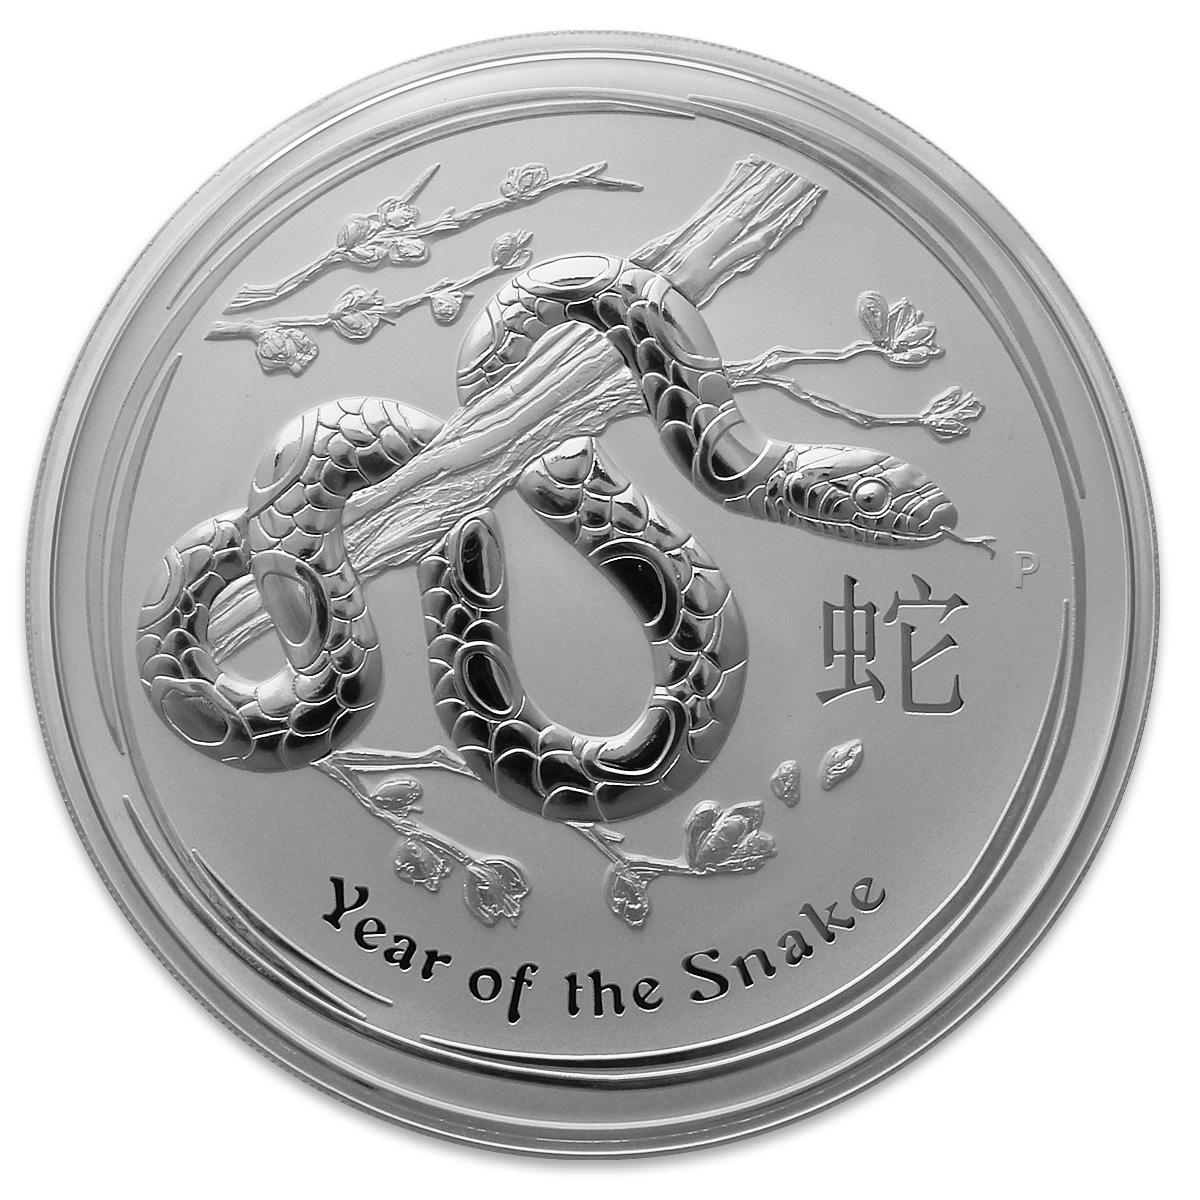 2013 Lunar Snake 1kg Silver Coin Kilogram Silver Bullion